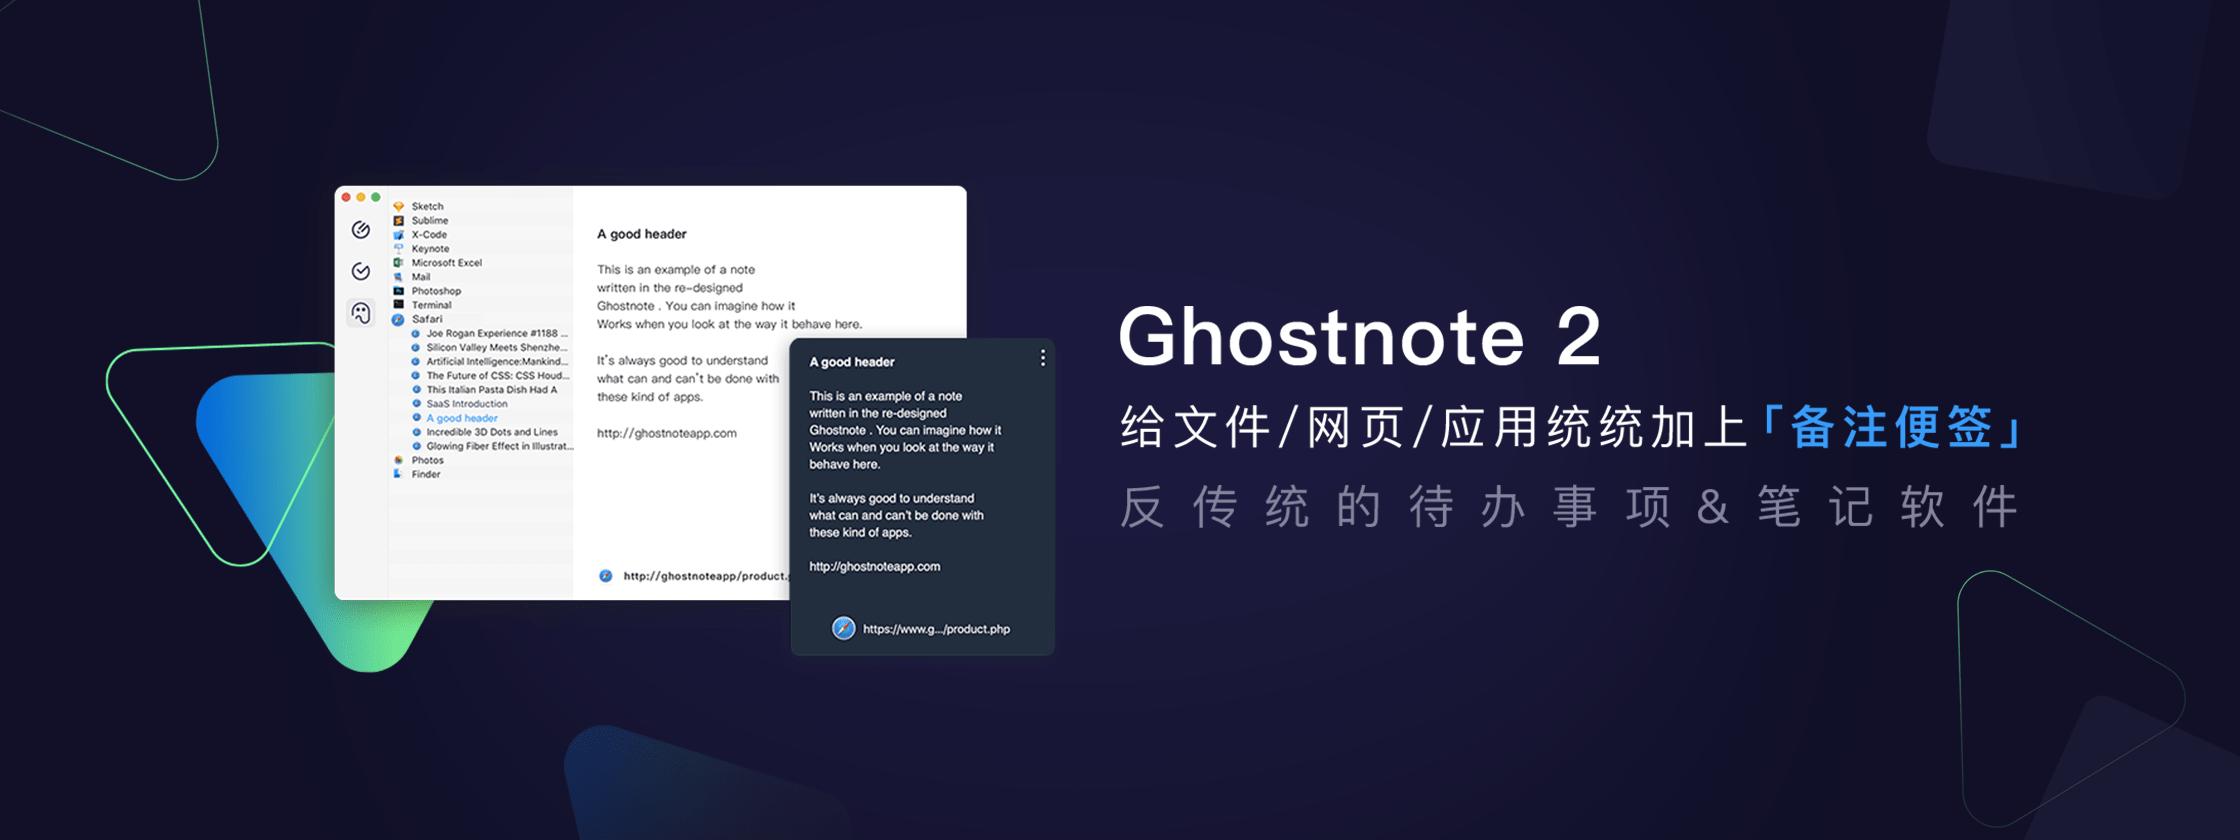 Ghostnote 2 – 给文件/网页/应用统统加上「备注标签」 !新颖的场景式笔记工具